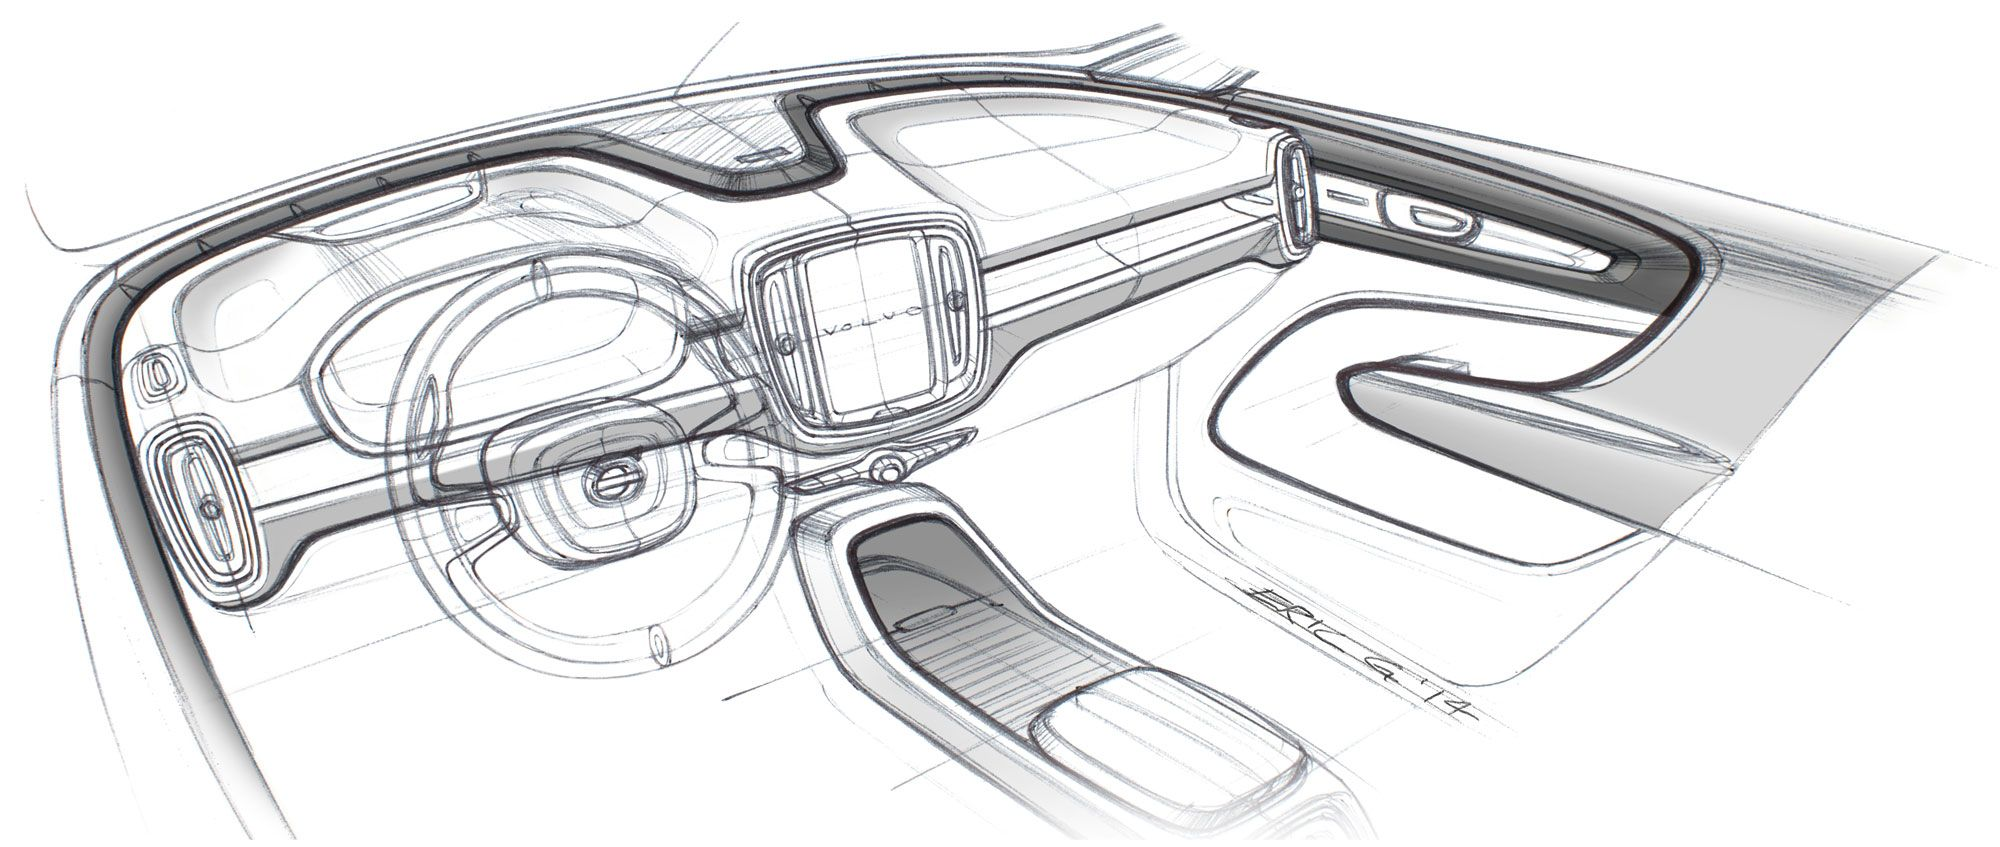 Pin By Josh Ortega On Car Design Interior Sketches Car